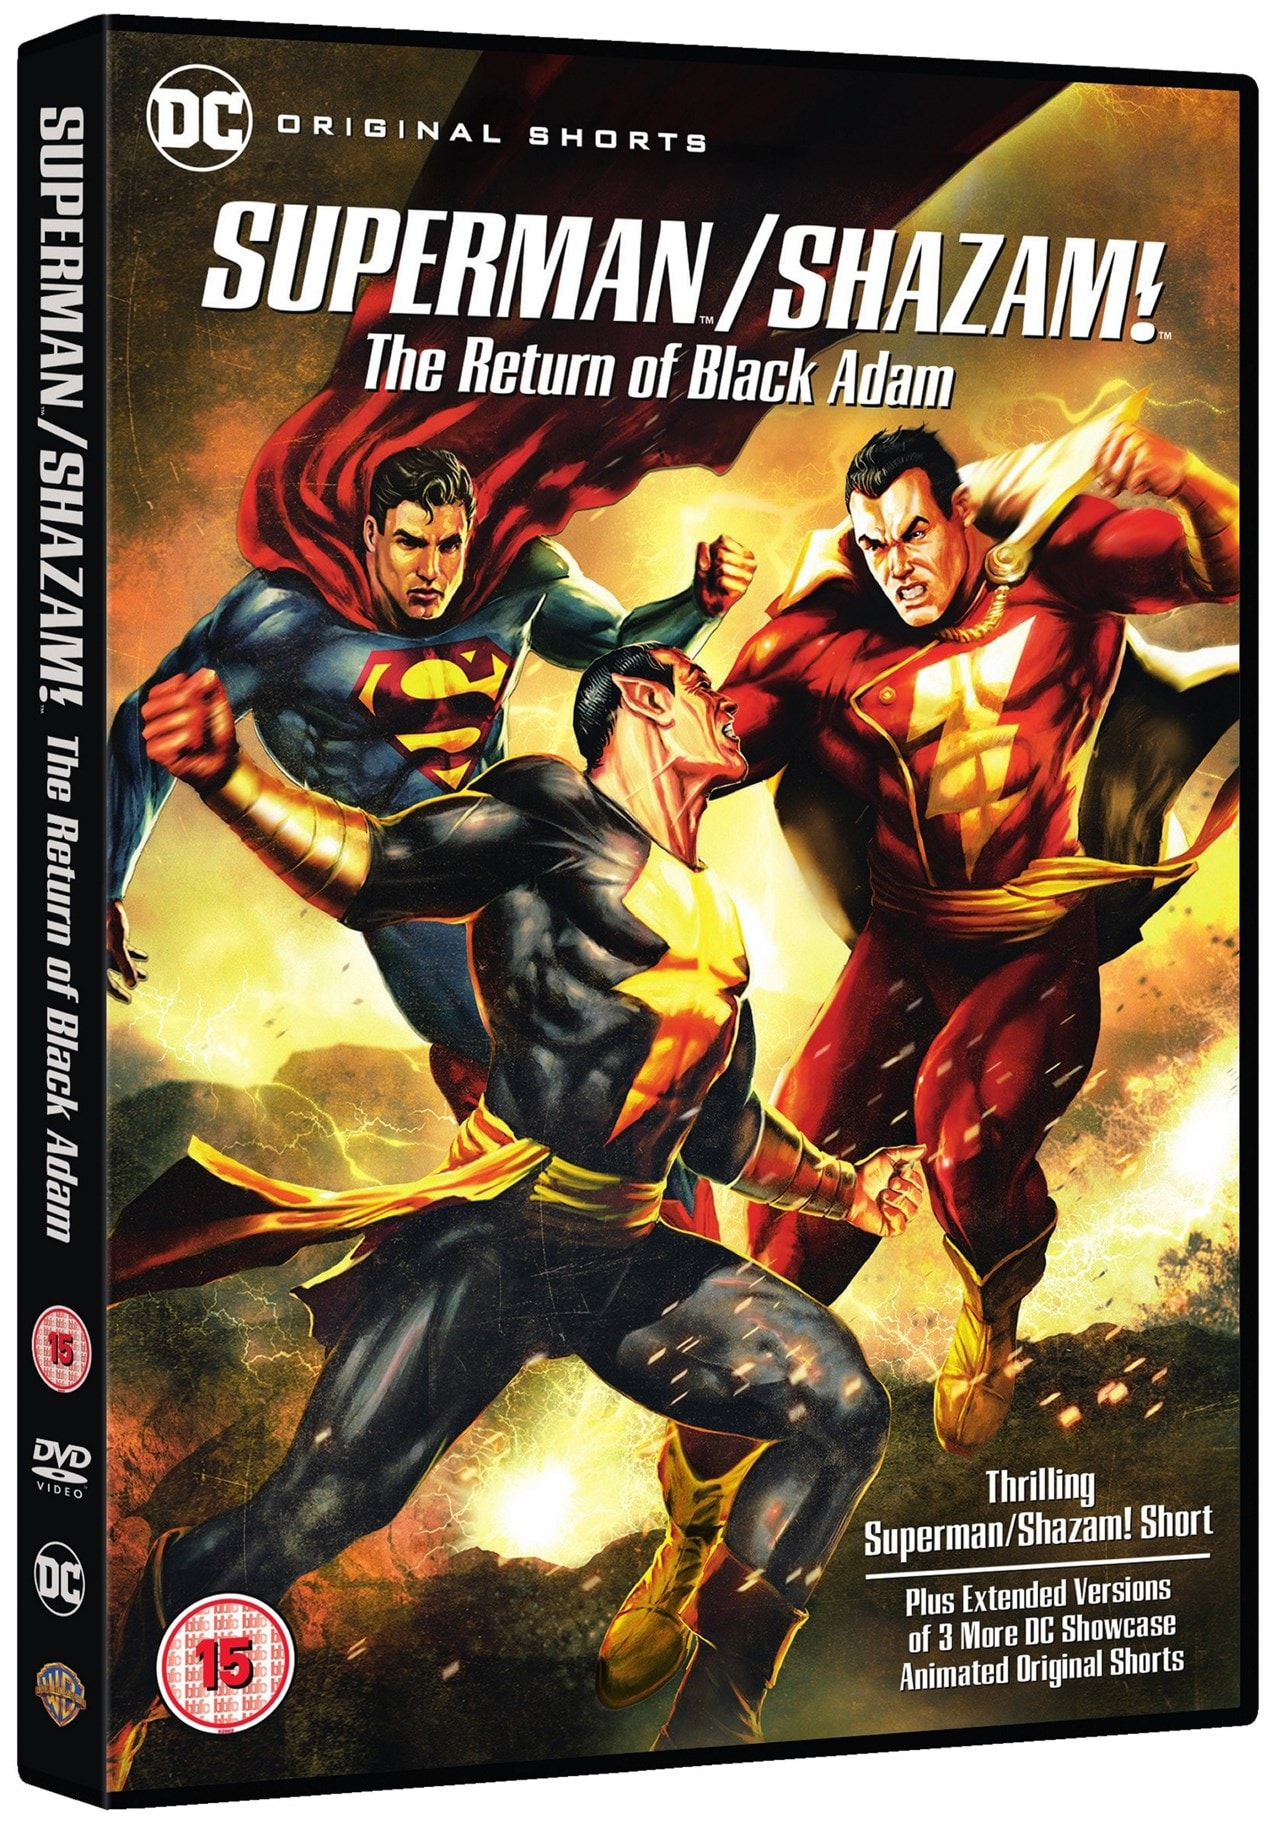 Superman/Shazam!: The Return of Black Adam - 2